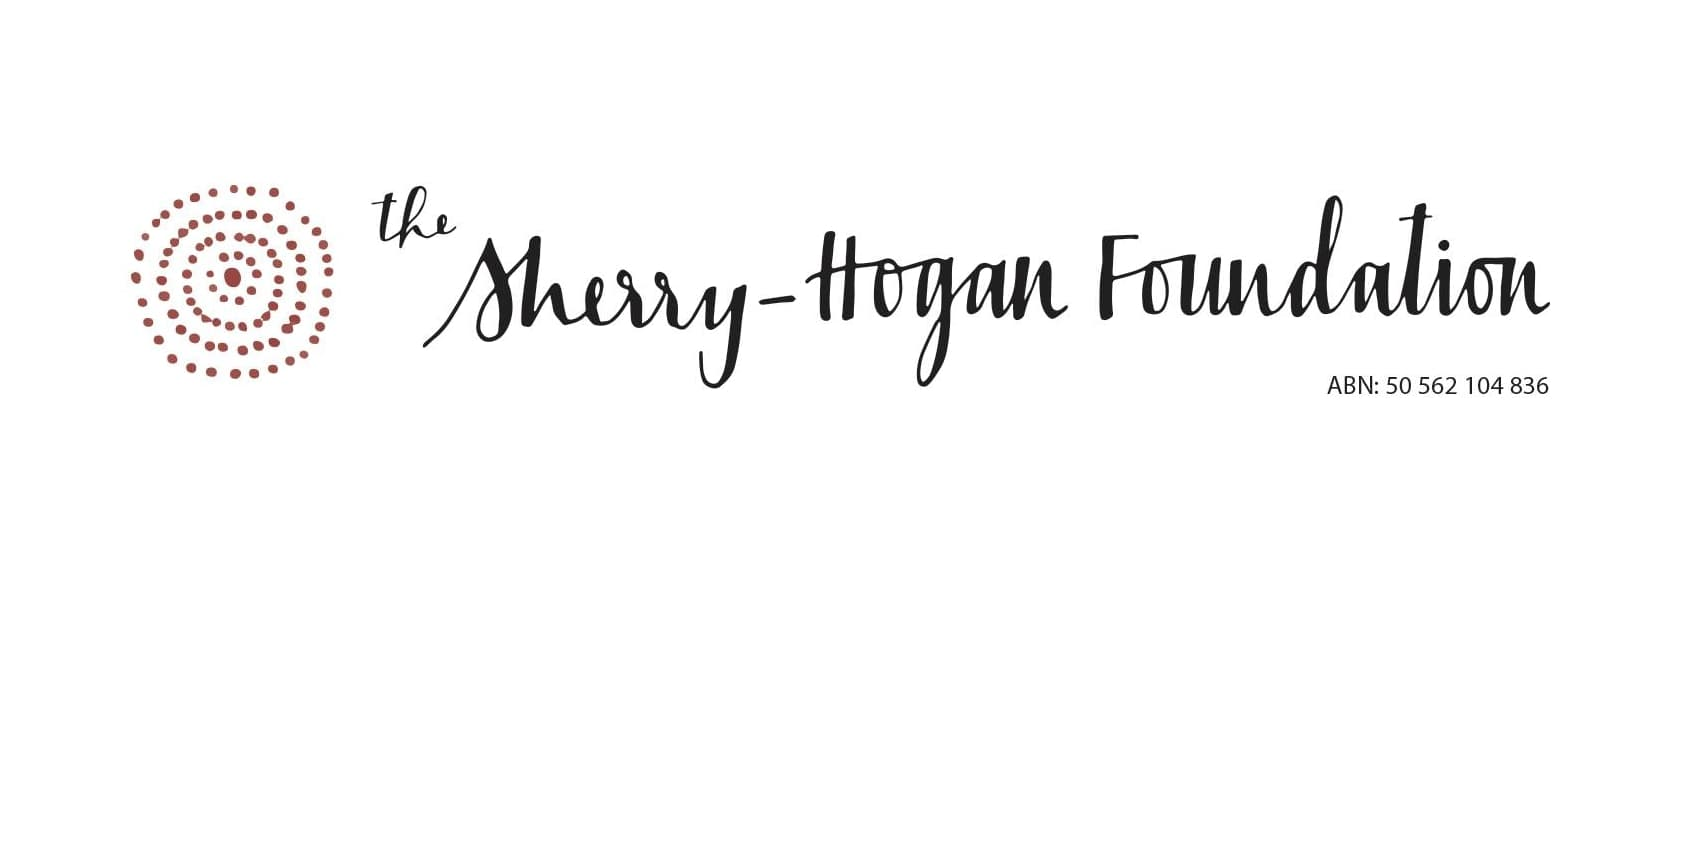 Sherry Hogan Foundation, Ann Sherry, Michael Hogan, Be Kind Sydney, Sydney Community Foundation, Sydney Women's Fund, Sydney Women's Charity